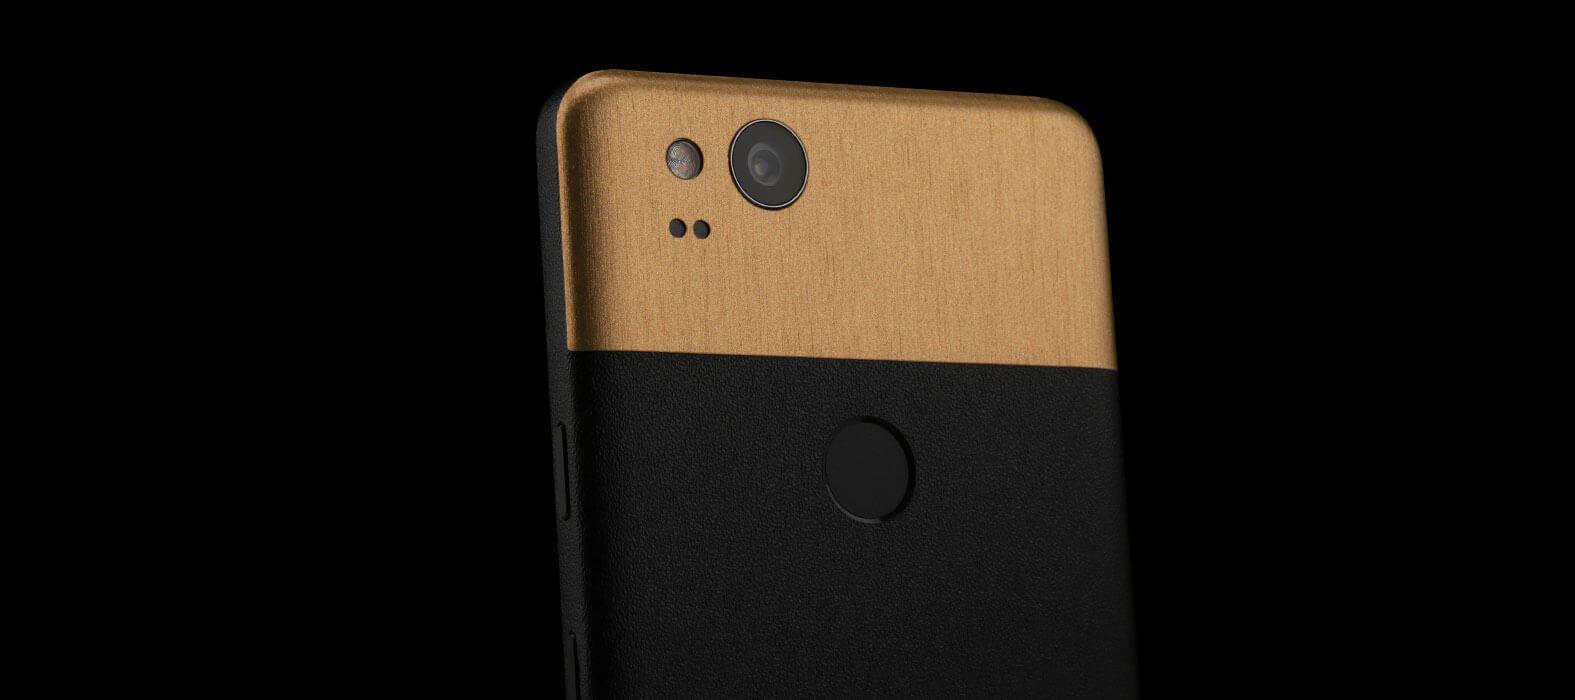 Pixel 2 Wraps, Skins, Decals - Sanstone Black